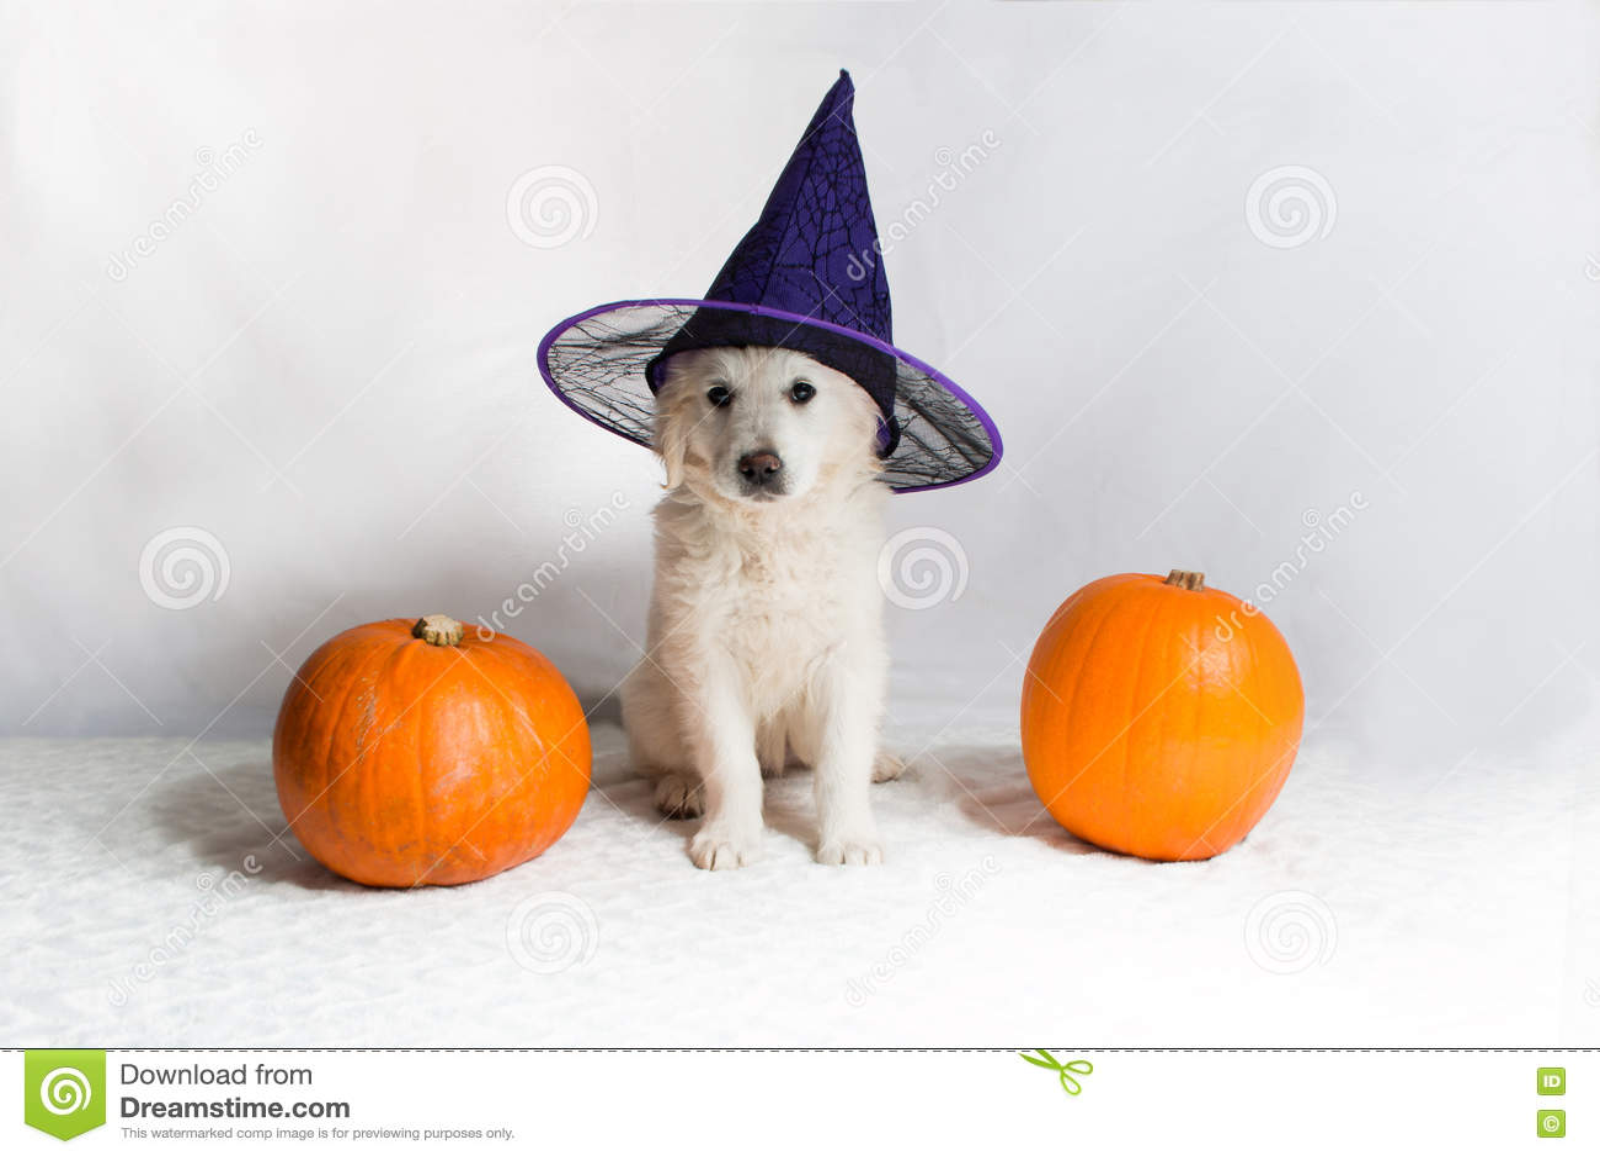 Golden Retriever Puppy With Pumpkins Stock Photo Image Of Pumpkins